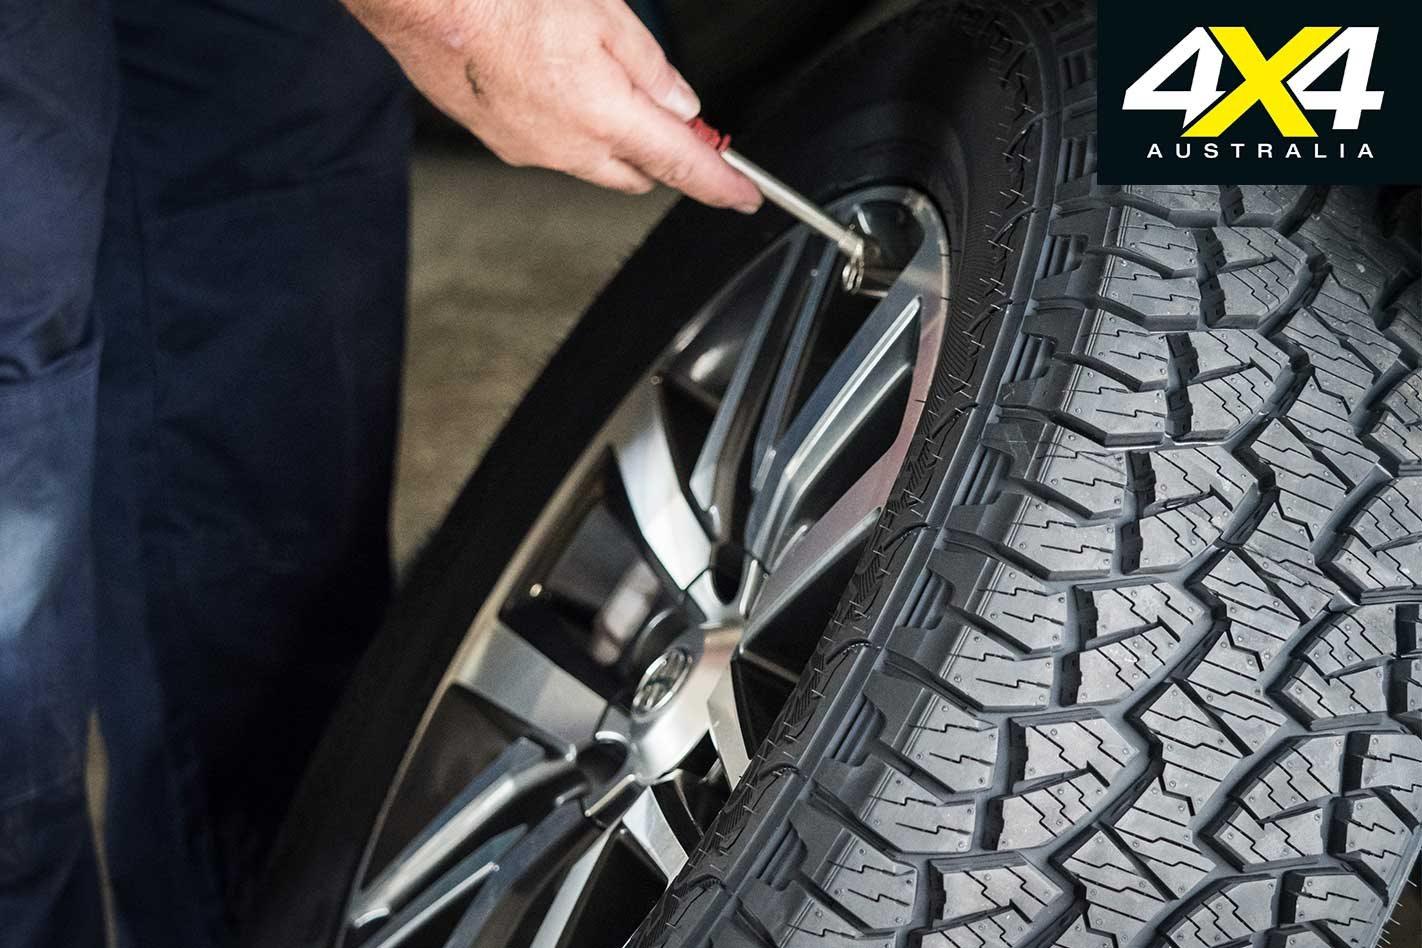 4x4 Tyre Test 2018